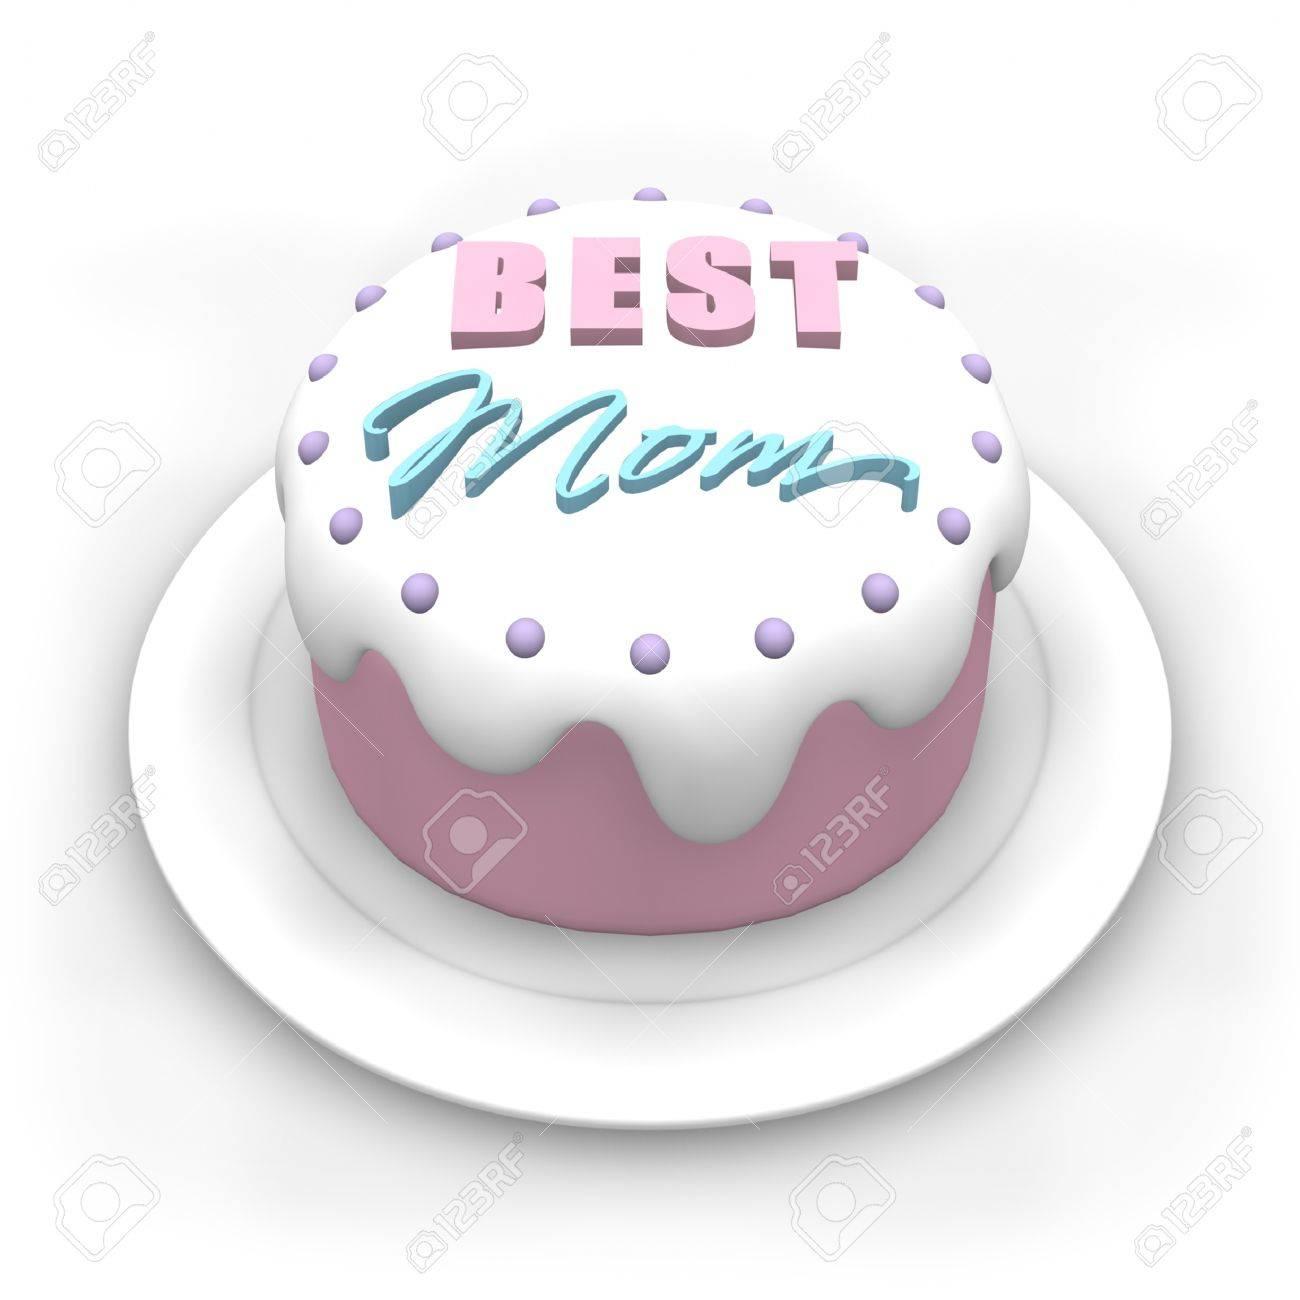 3d Pastellfarbenen Kuchen Fur Muttertag Lizenzfreie Fotos Bilder